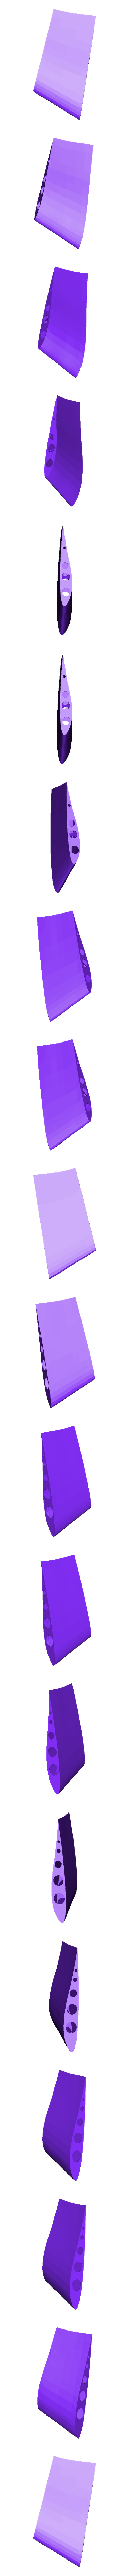 Wing R 2.obj Download free OBJ file Small Static Horten 229 • 3D printable object, francoispeyper